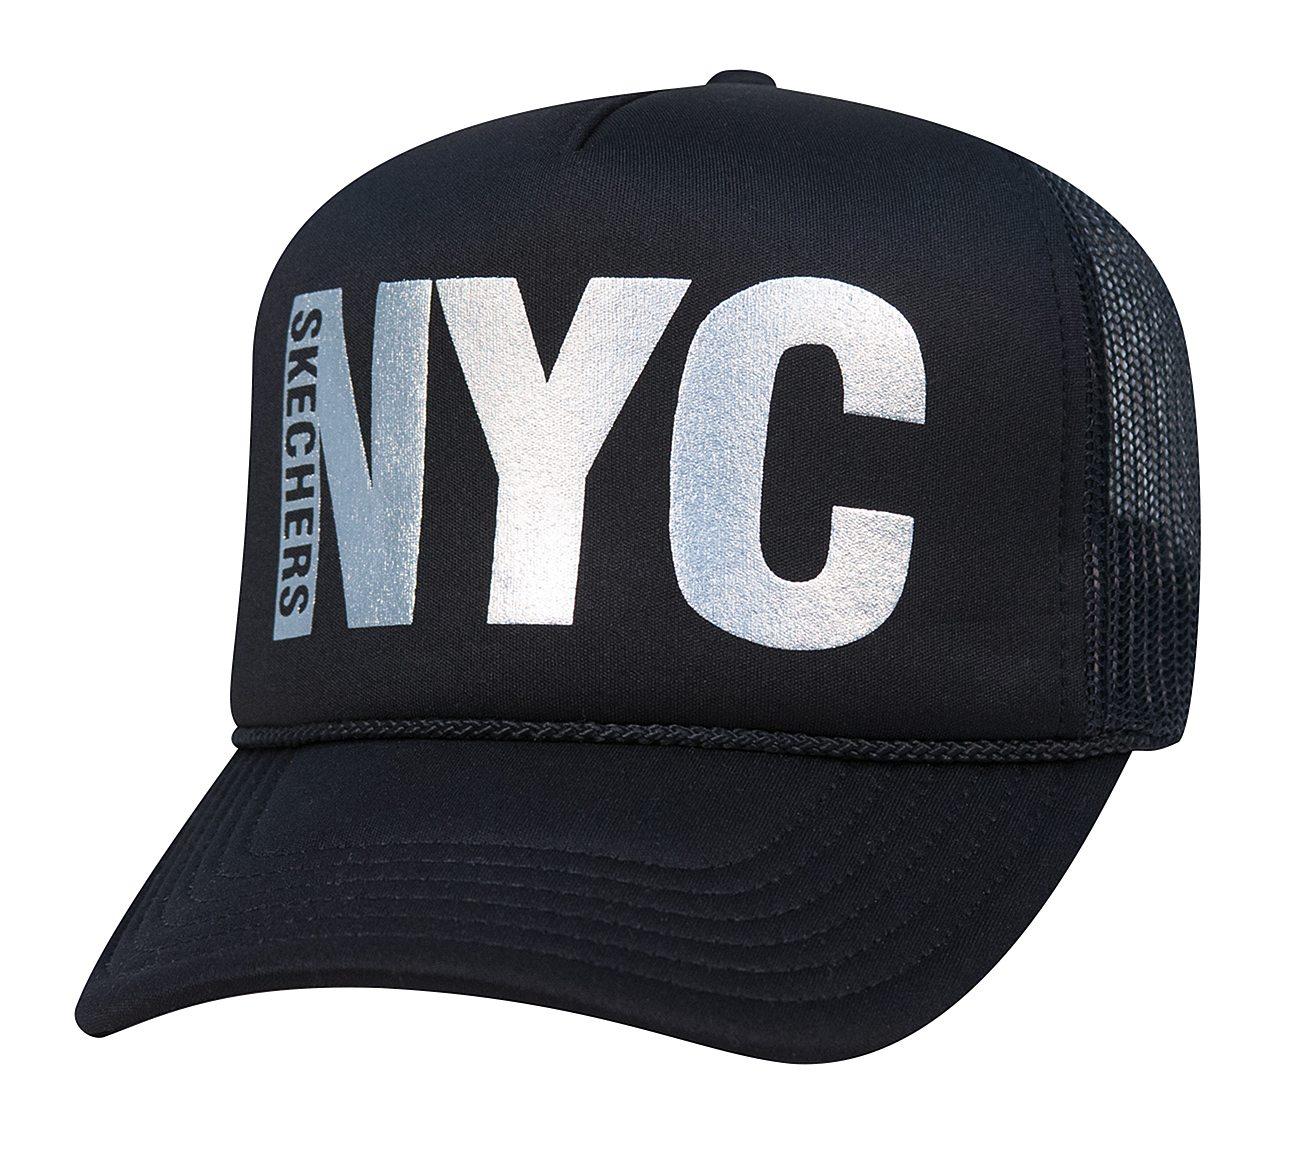 City Hat - NYC